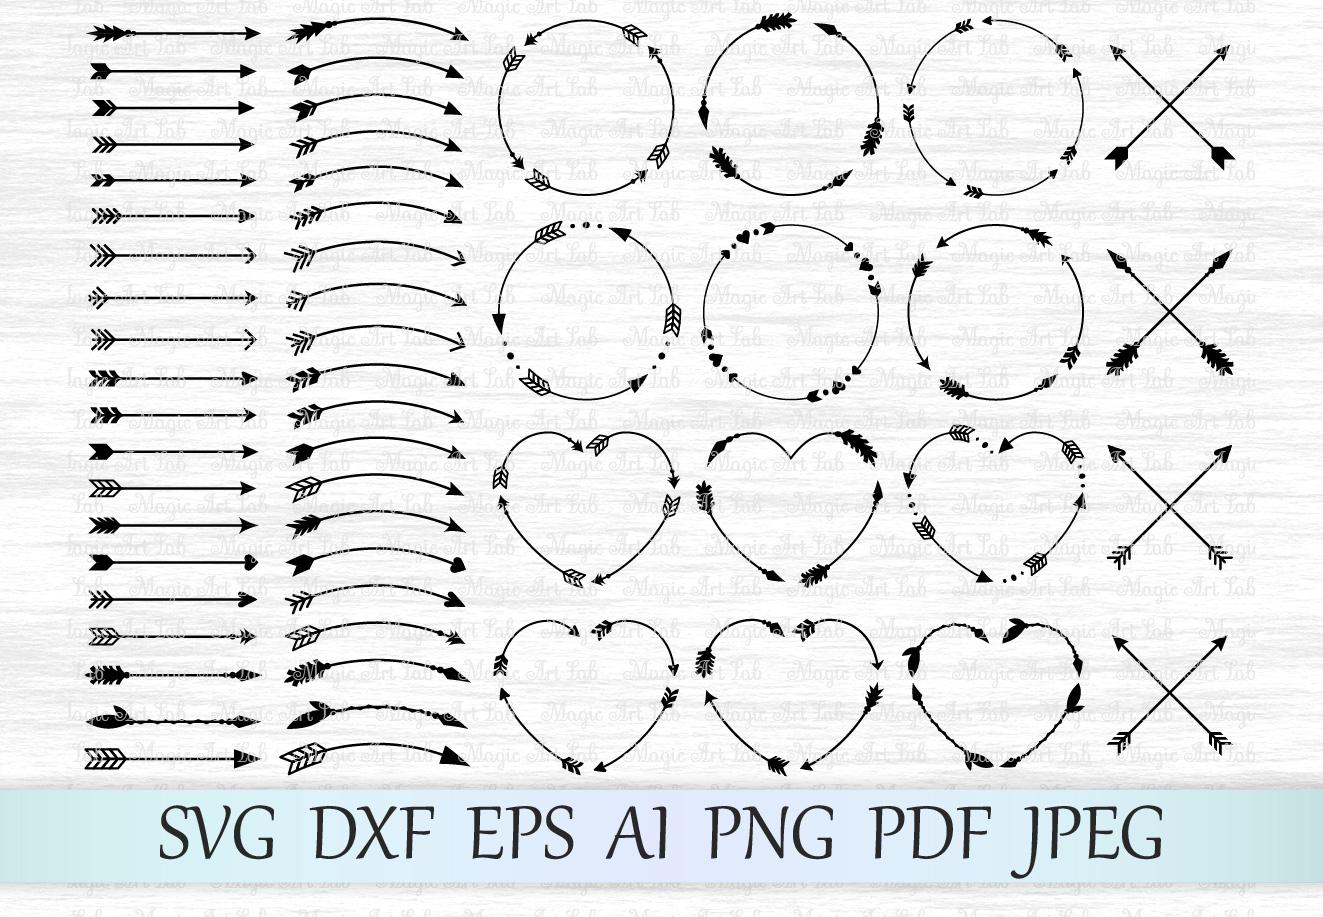 Arrows svg, Circle monogram svg, Circle frame arrow, Heart frame, Criss cross arrows, Tribal arrows svg, Boho arrows clipart, Ethnic aztec example image 1